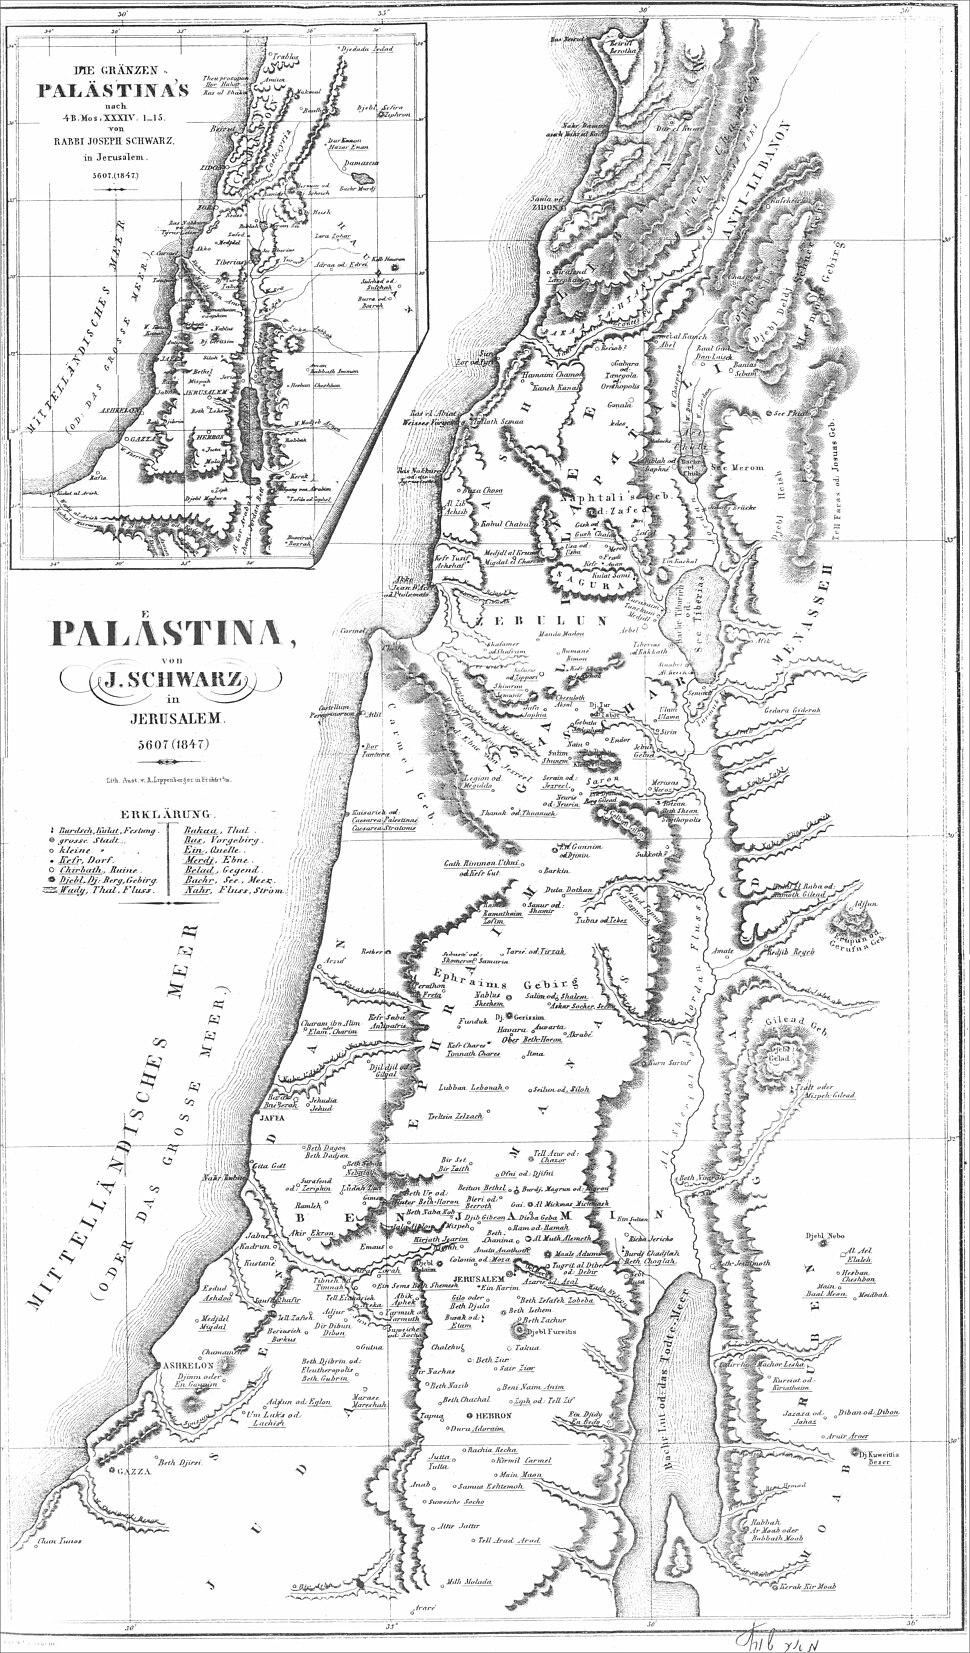 IsraelMapByRabbiJosephSchwarzAt1847